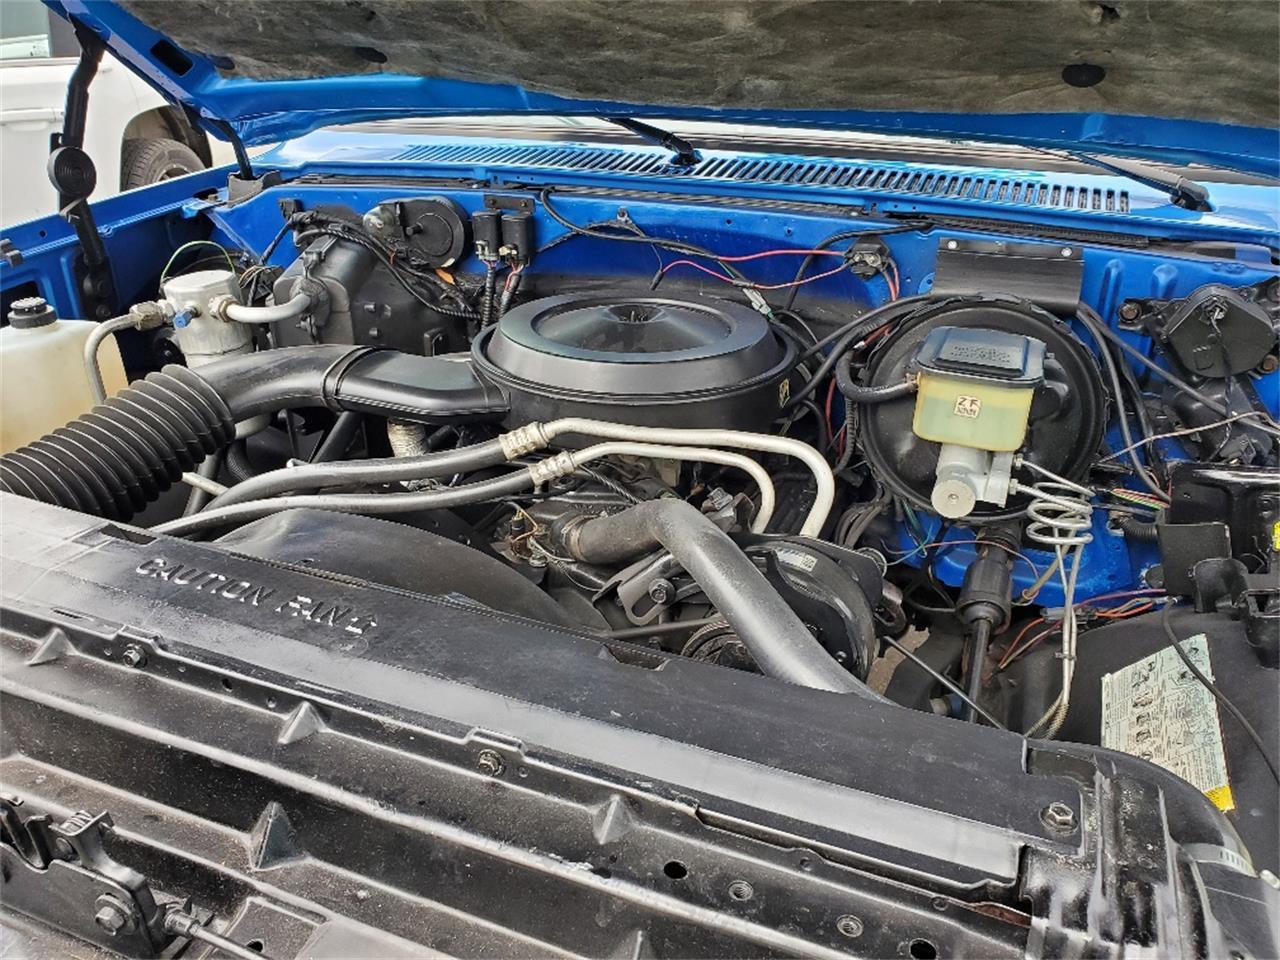 1987 Chevrolet Blazer (CC-1391253) for sale in Excelsior, Minnesota